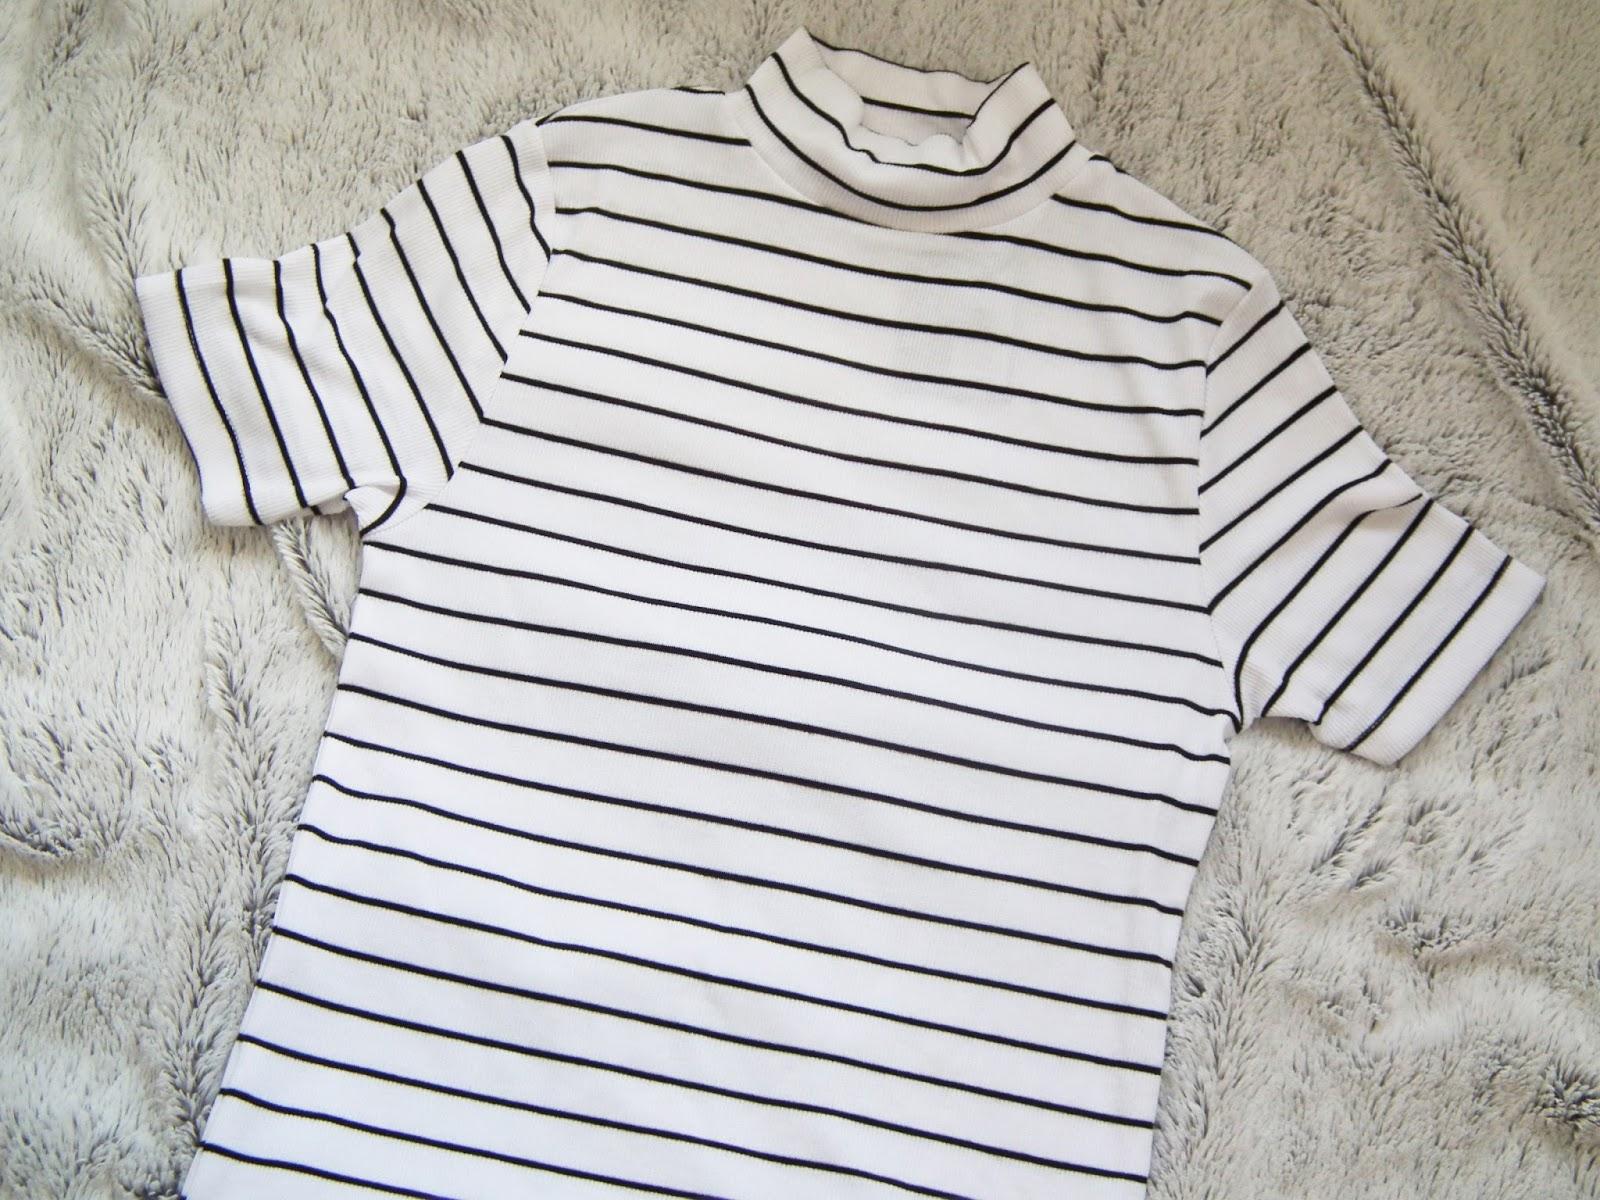 Primark Haul - Spring 2016 White and black striped high neck t-shirt